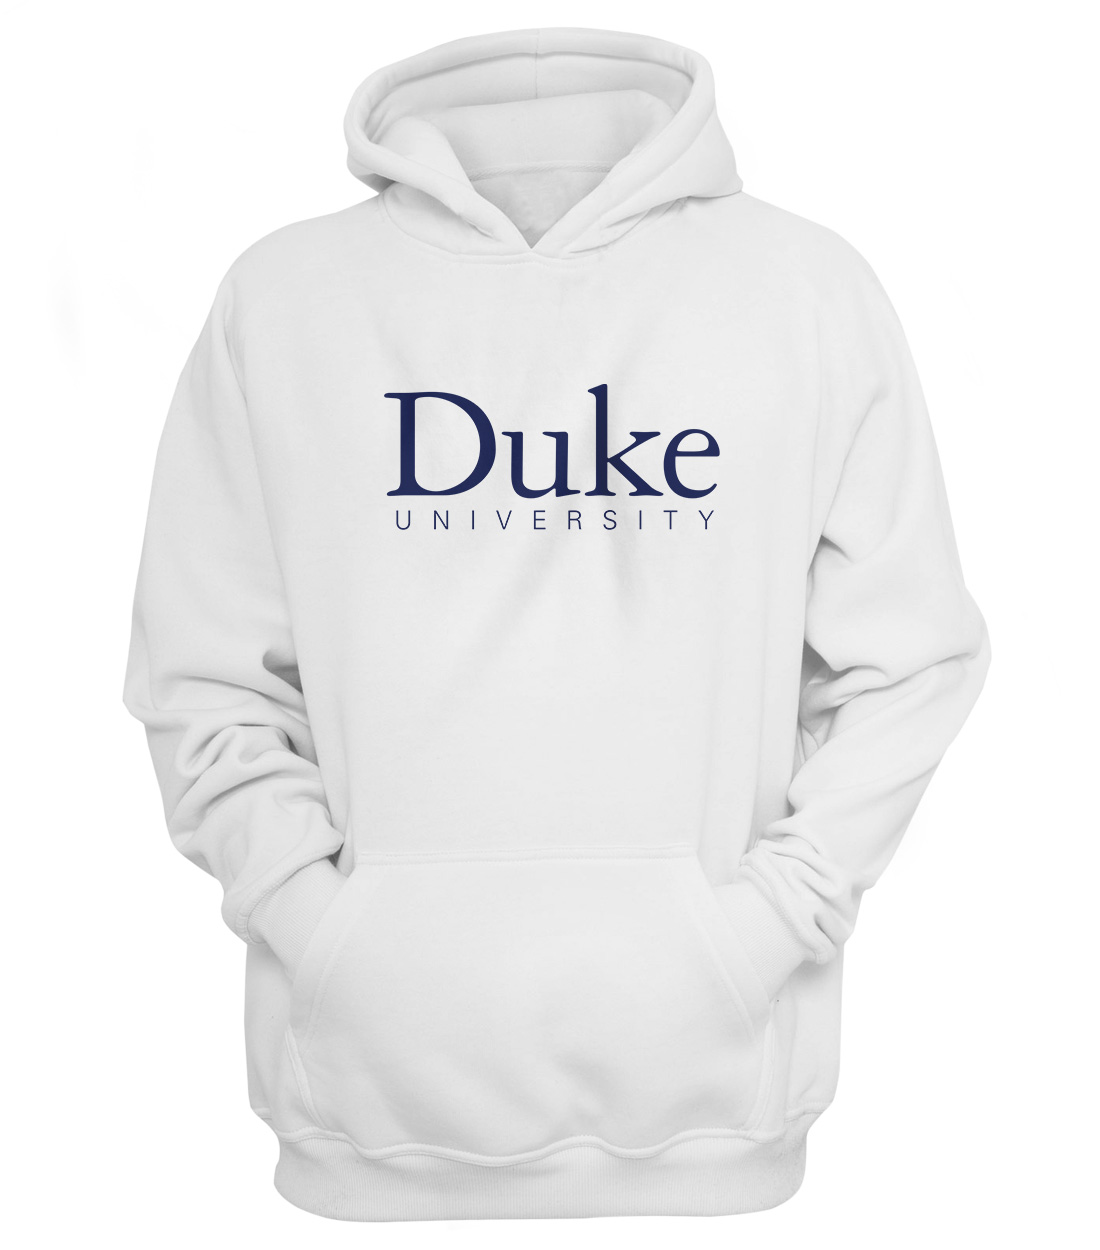 Duke University Hoodie (HD-WHT-ncaa-NP-duke-512)